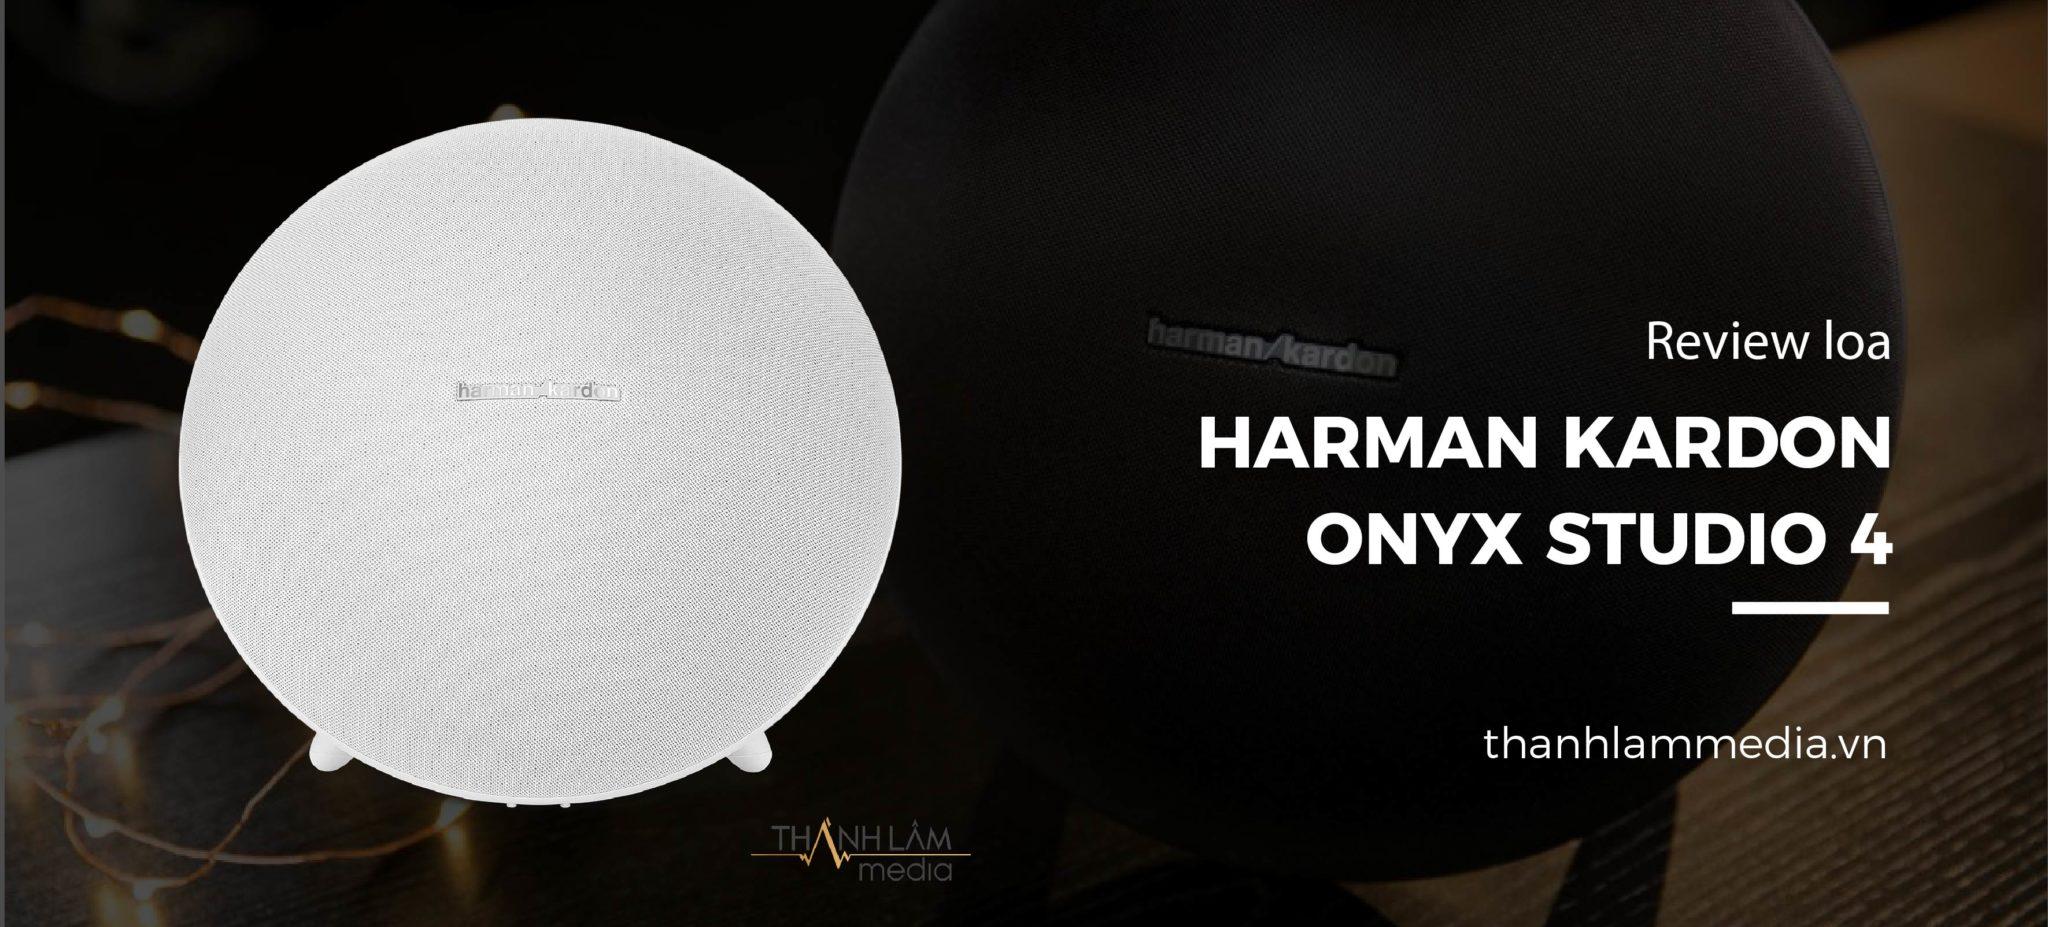 Review đánh giá loa Bluetooth Harman Kardon Onyx Studio 4 1